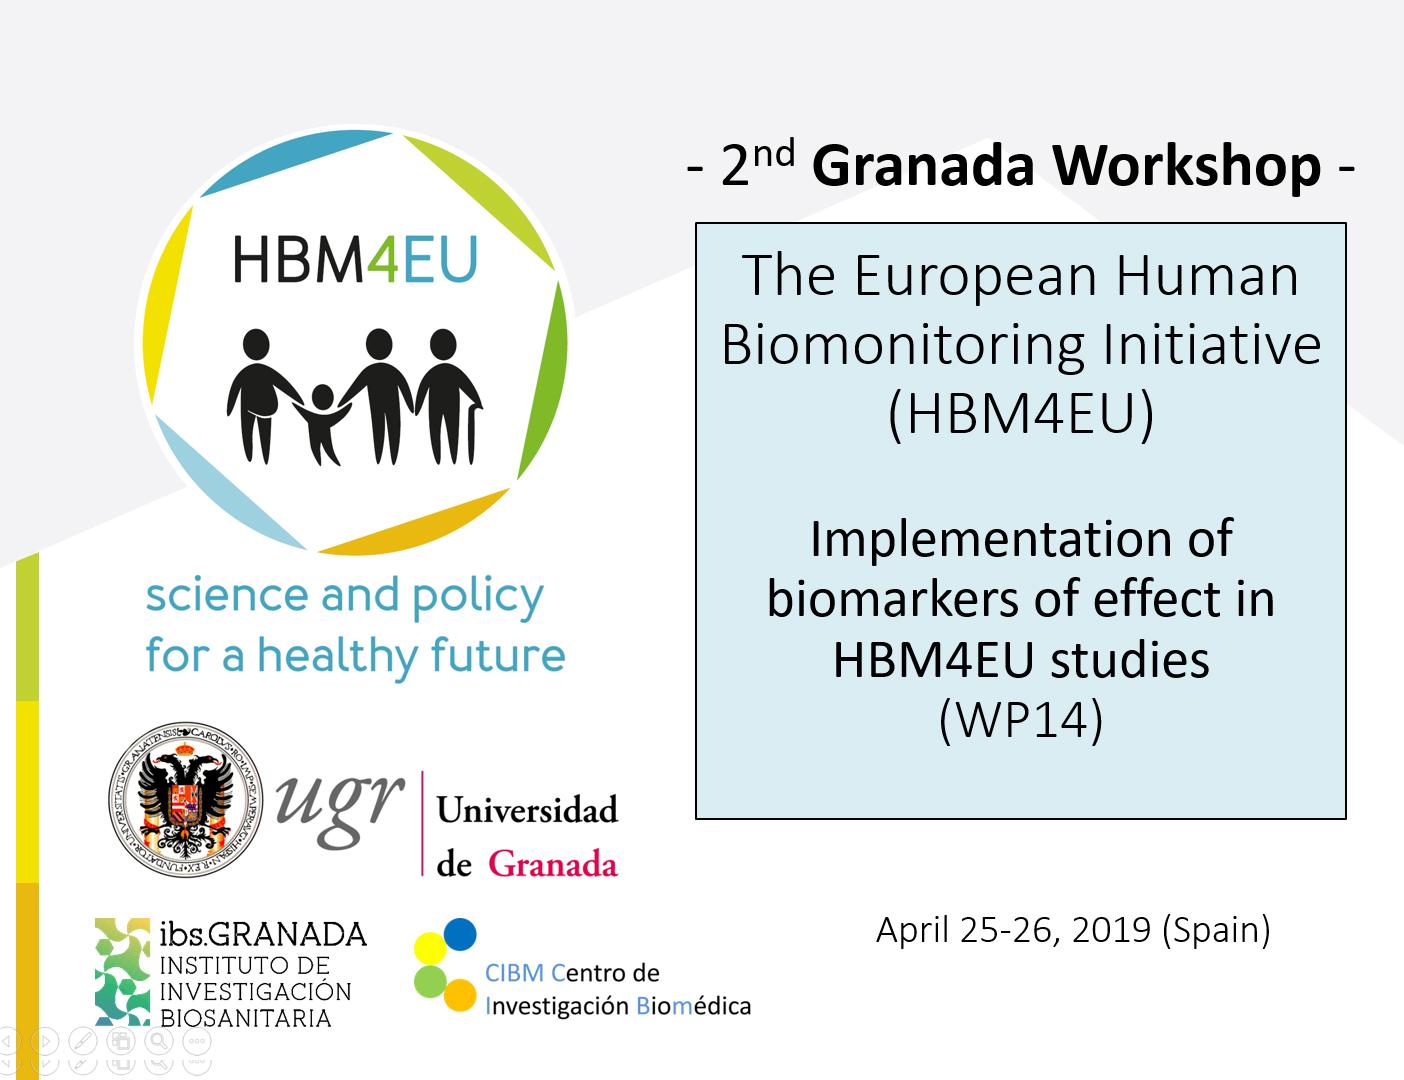 2nd Granada Workshop - The European Human Biomonitoring Initiative (HBM4EU)